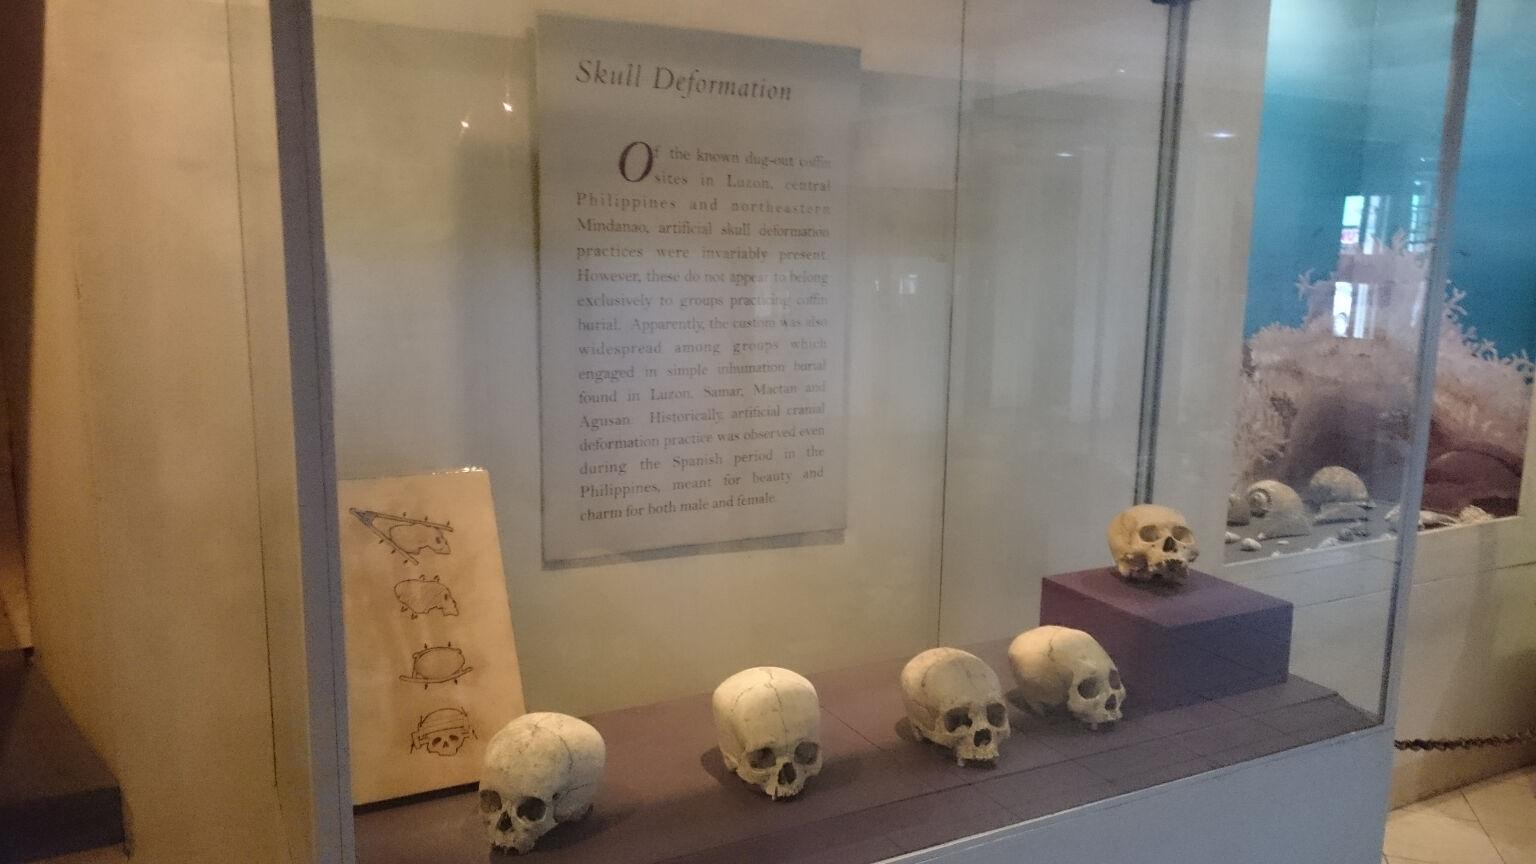 tagbilaran-bohol-national-museum-skull-deformation-exhibit